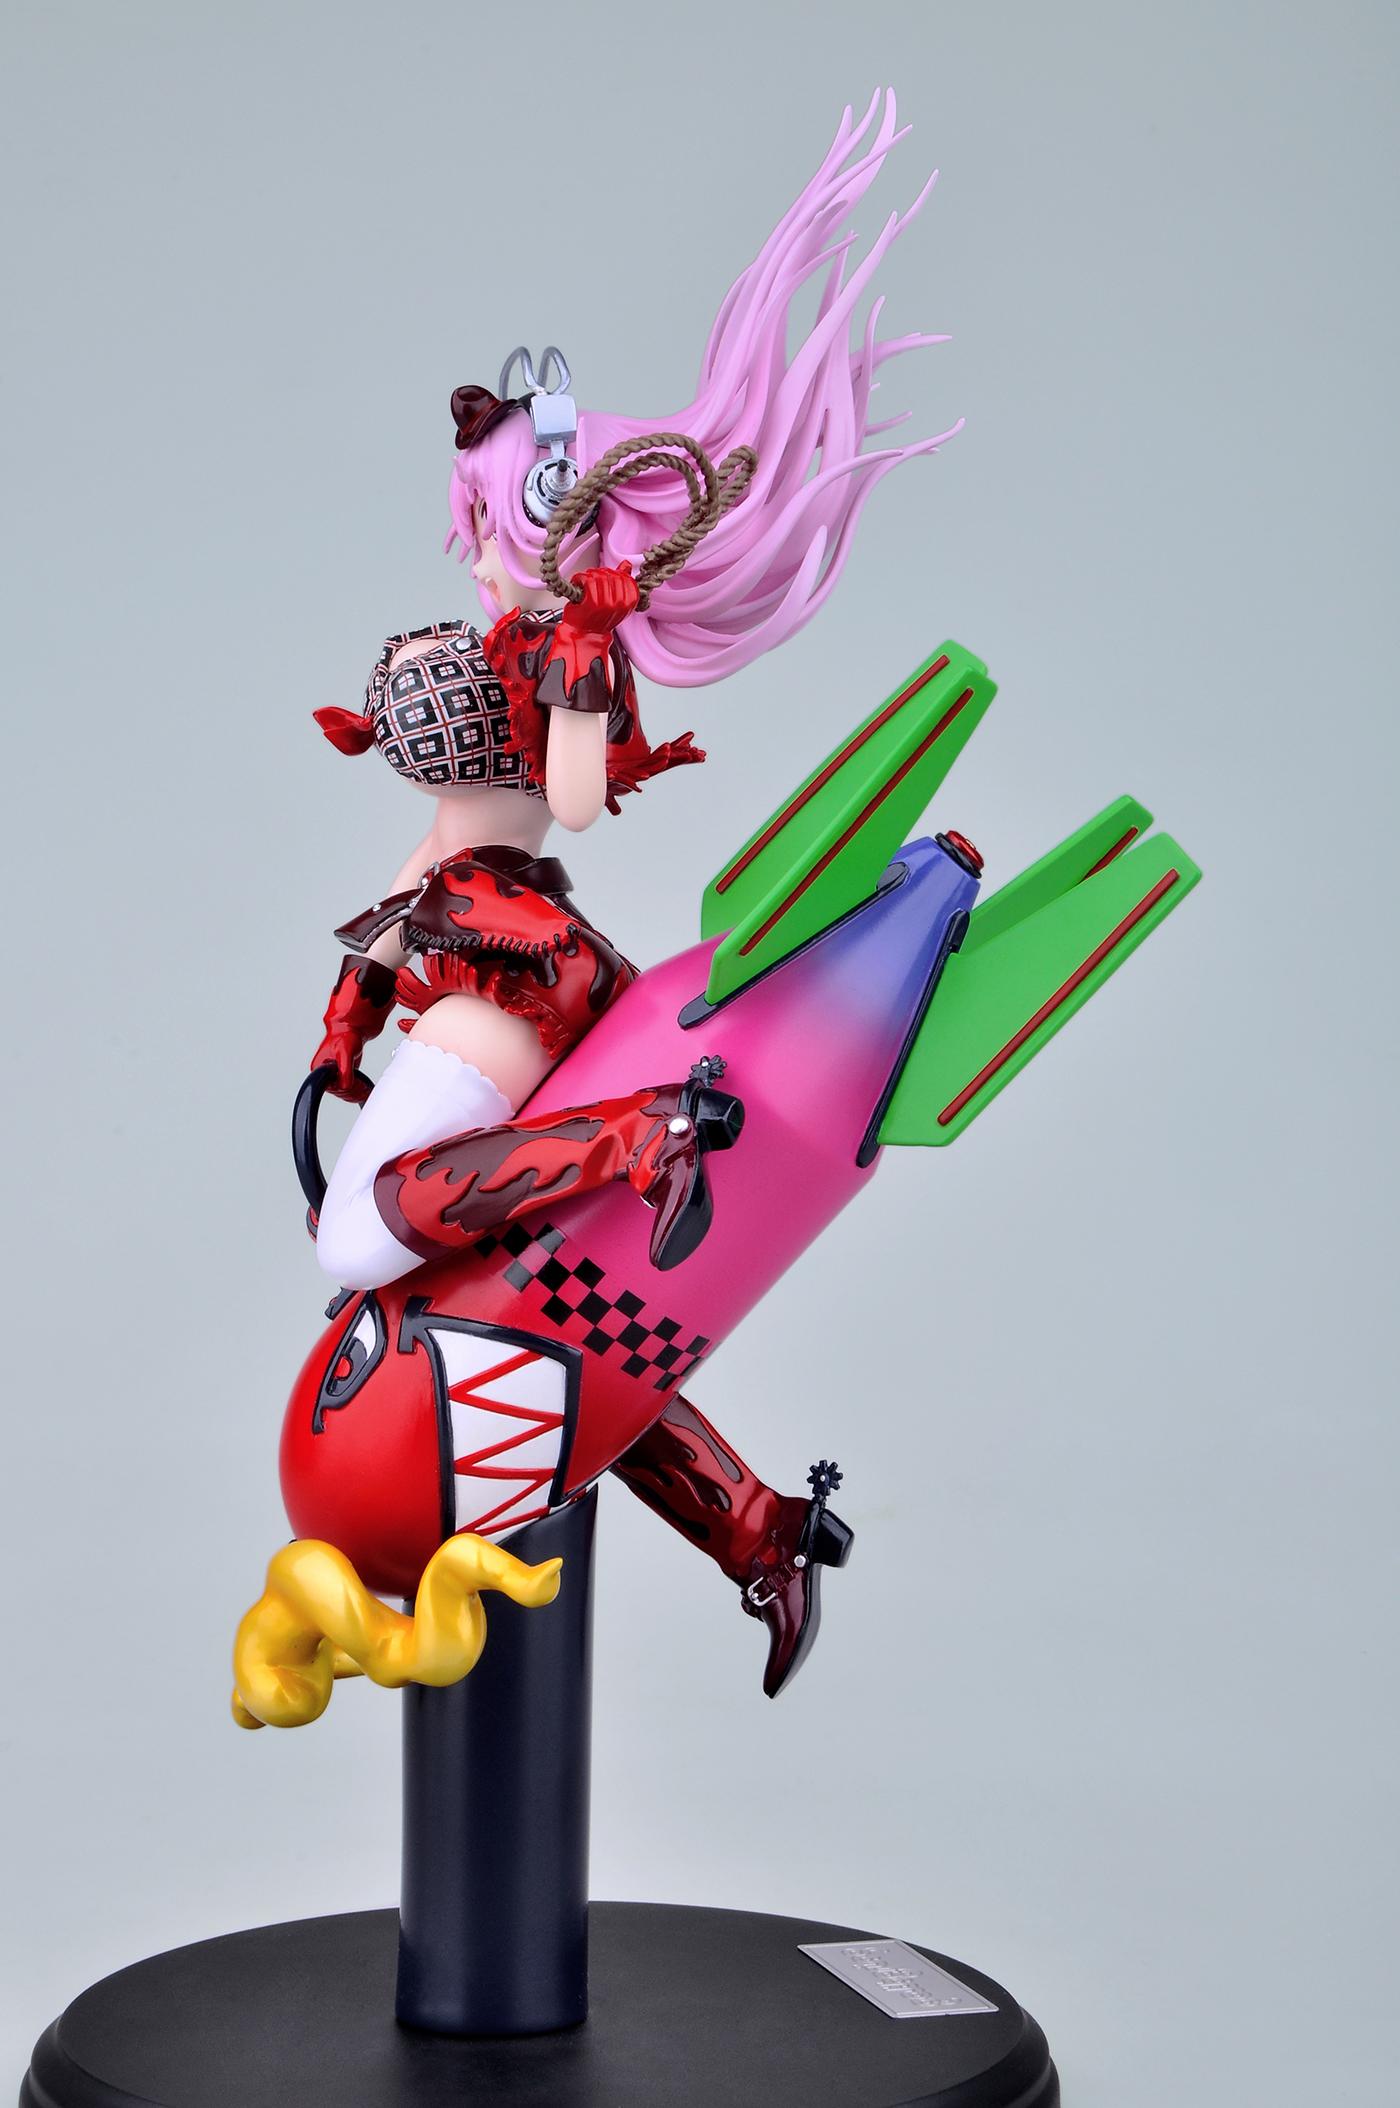 Nitroplus' Mascot Rides a Giant Rocket haruhichan.com Super Sonico rocket figure03